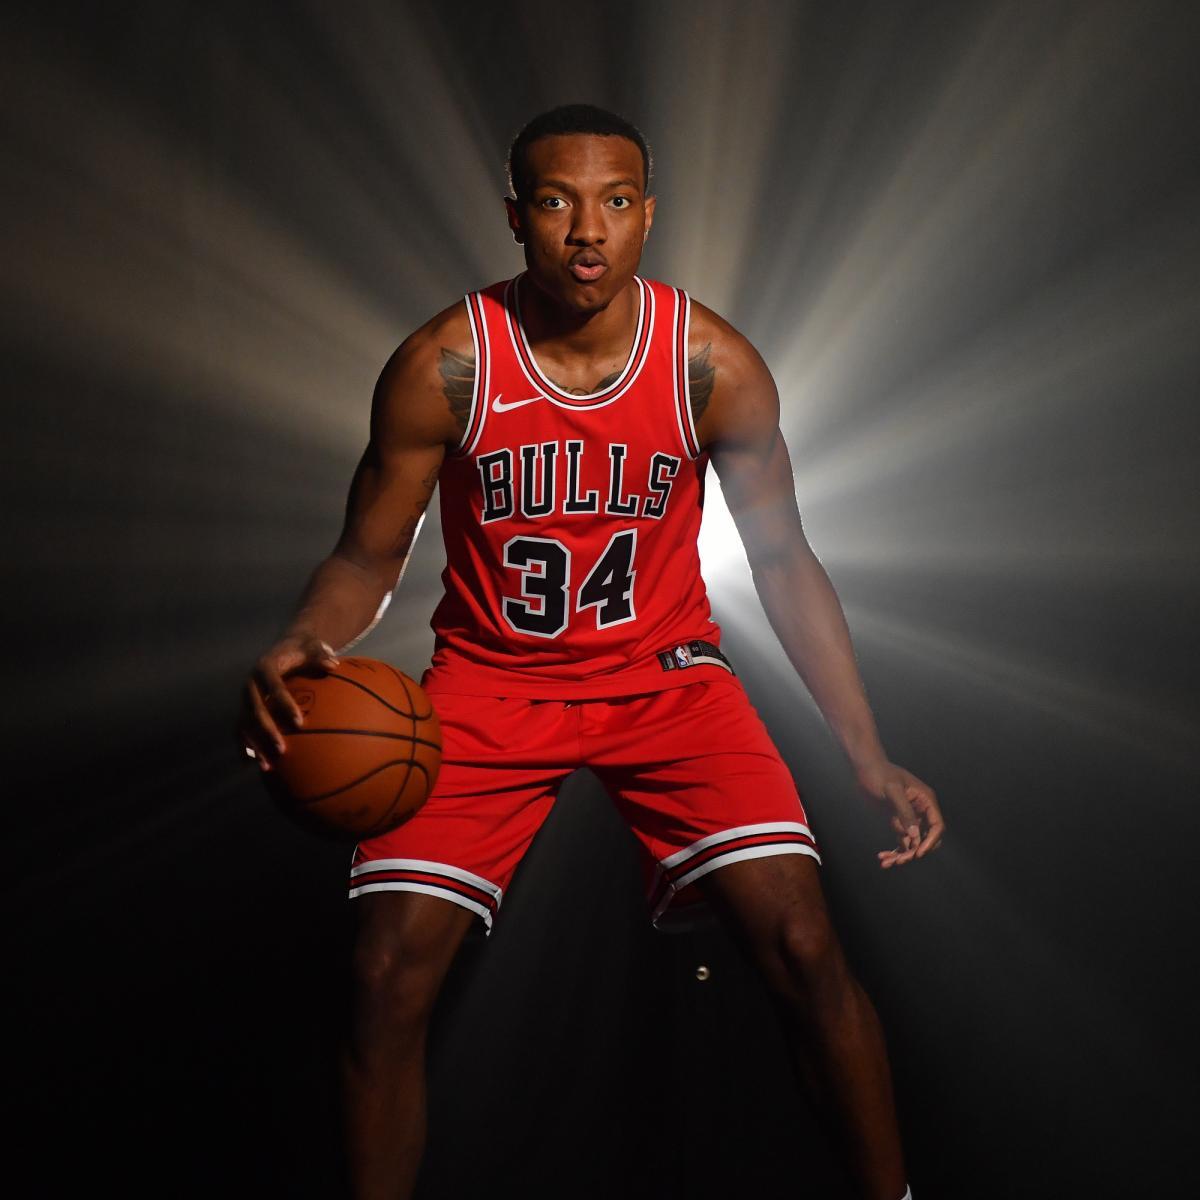 Nba Rookie Award Predictions For 2018 19 Season: Ranking NBA's Top 5 Rookie Centers Entering 2018-19